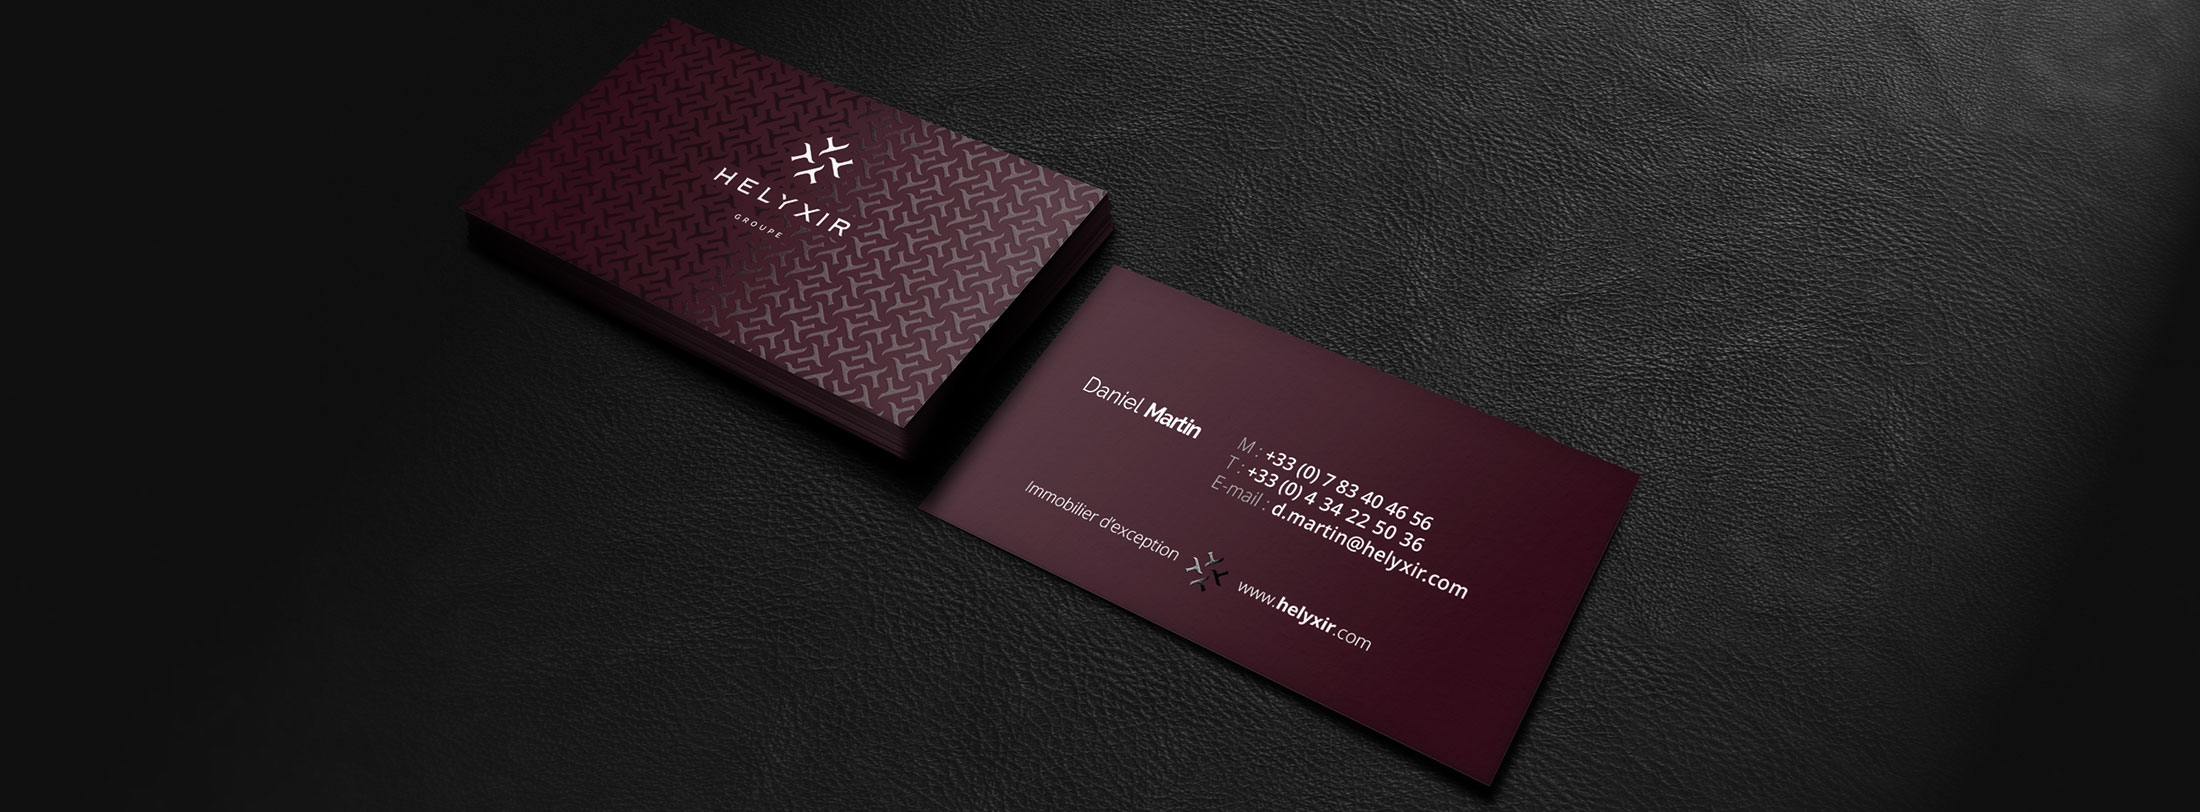 helyxir-osb-communication-logo-identite-visuelle-design-graphique-symbole-identite